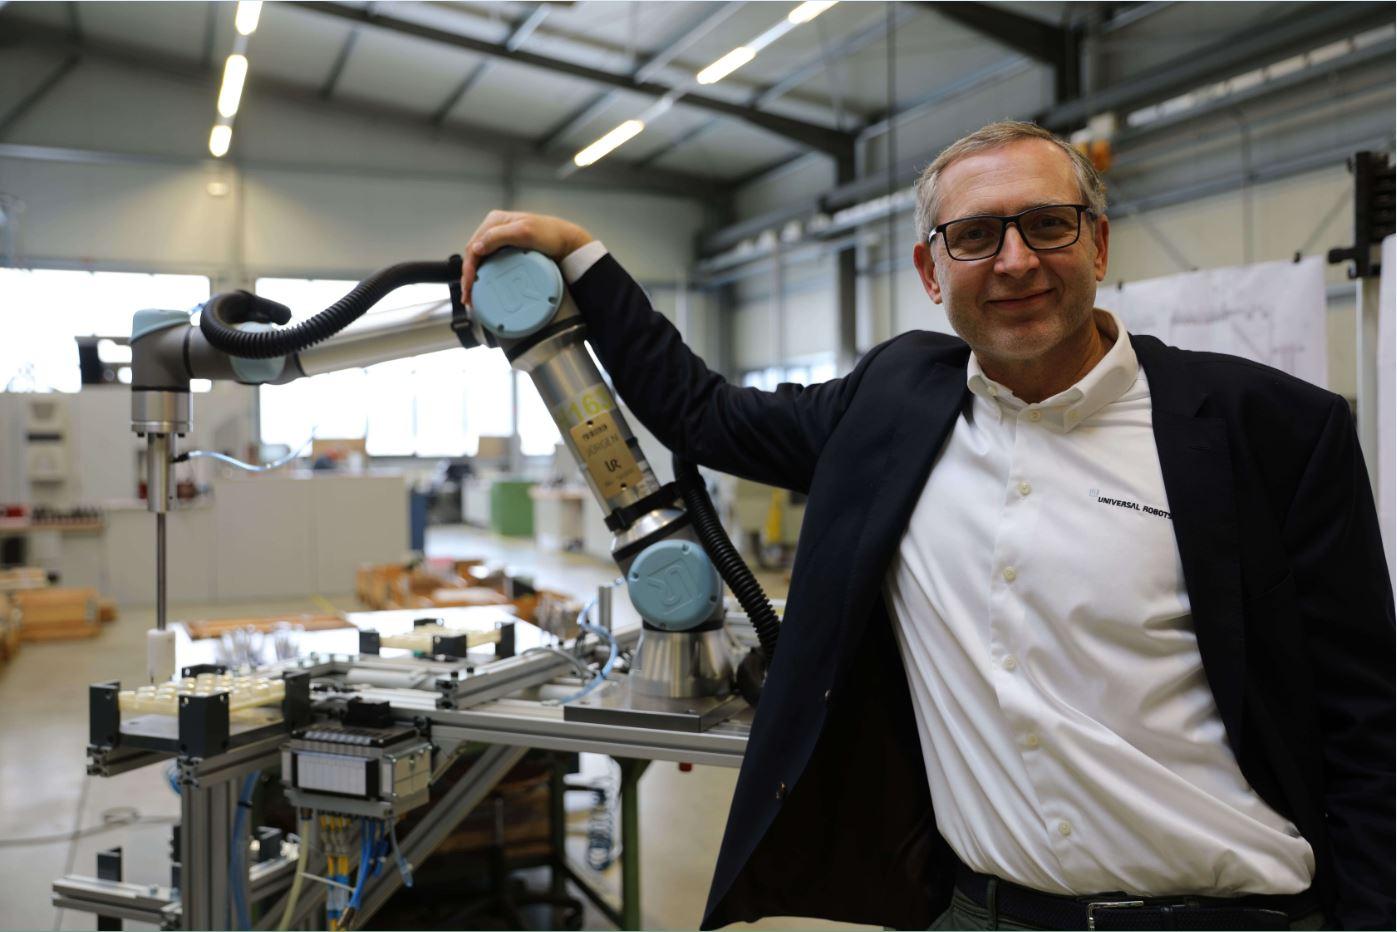 Universal Robots協作型機器人全球累計銷售達5萬台! 引領協作型自動化市場創下新里程碑